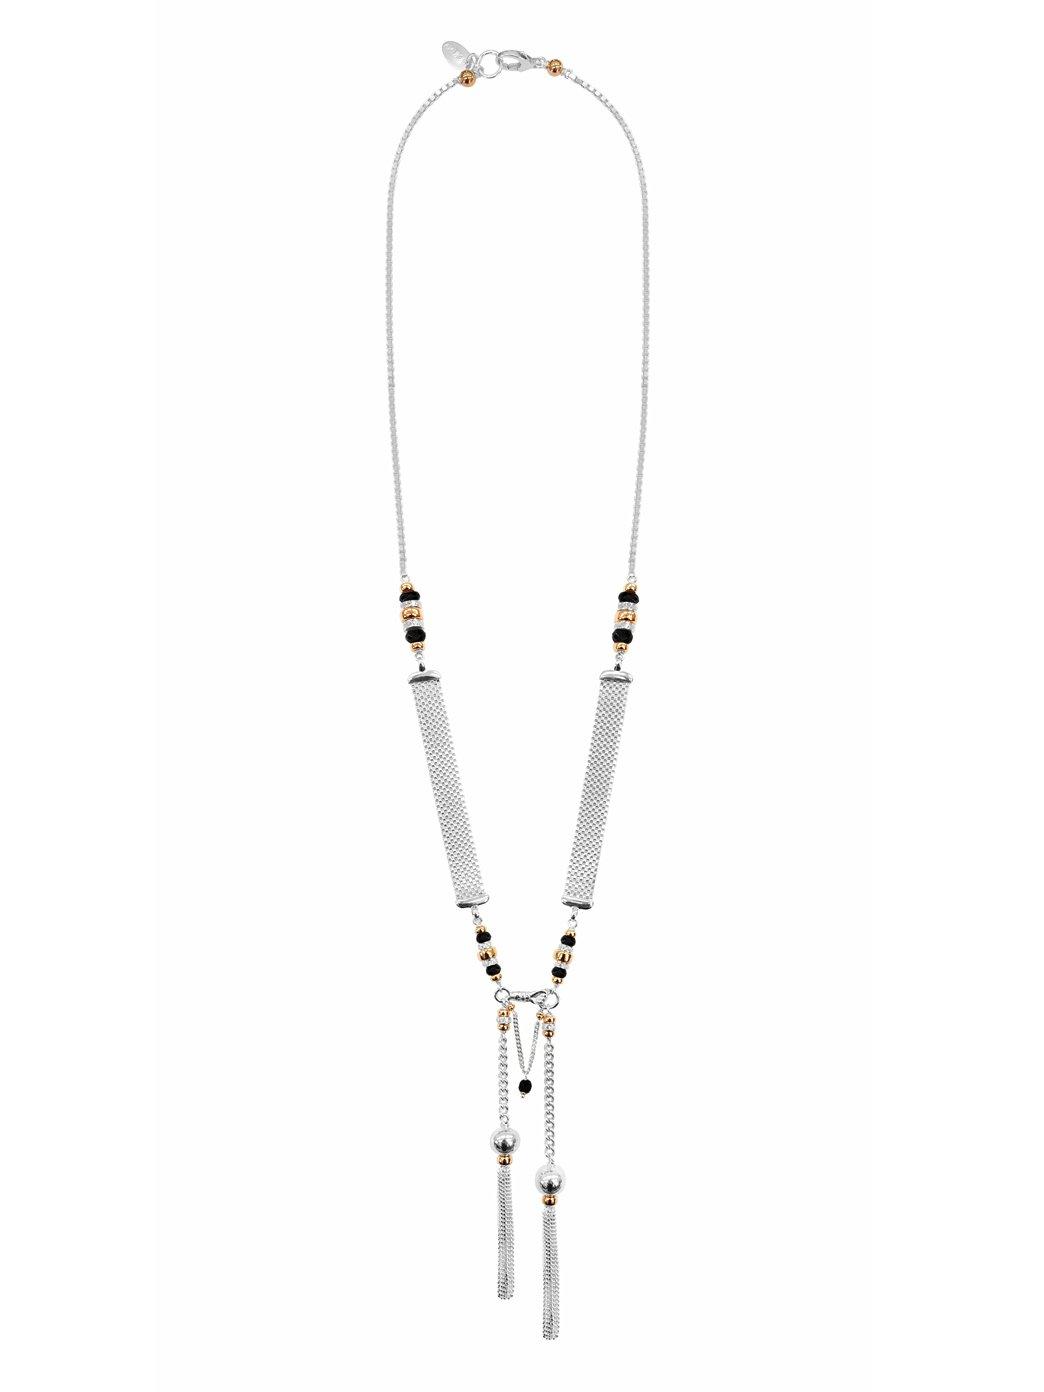 Harlow Noir Necklace -Onyx